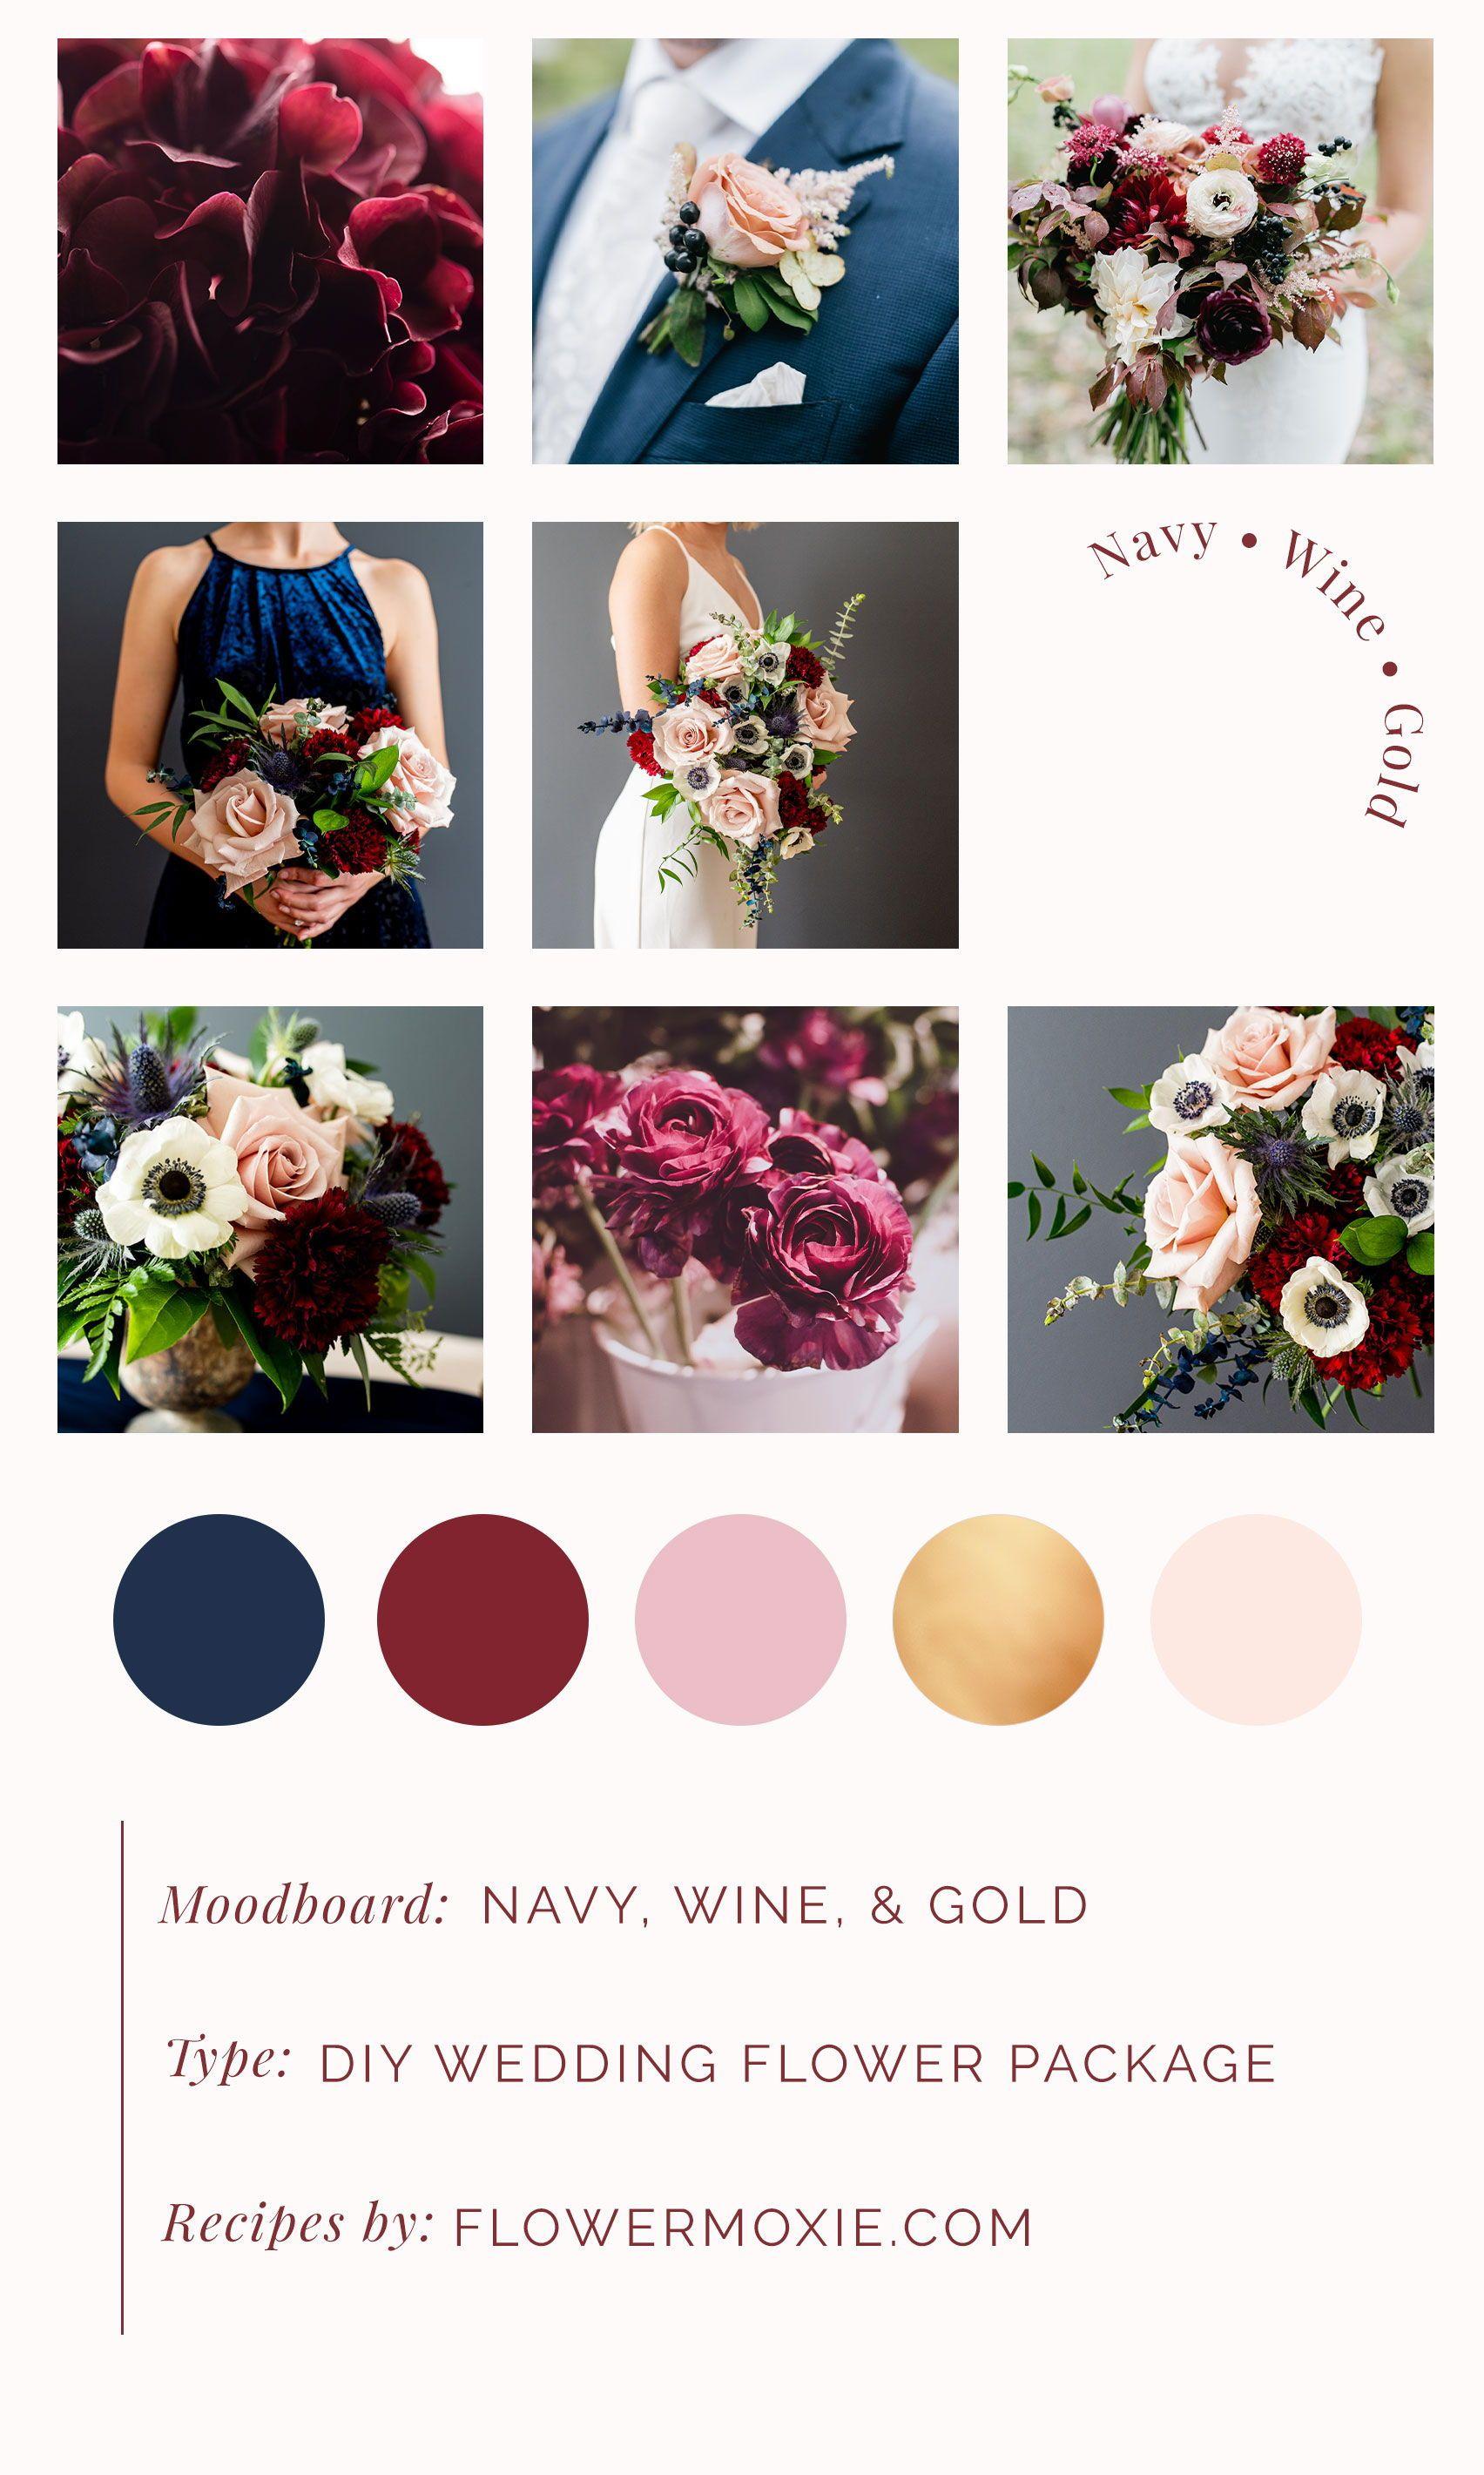 Flowermoxie Bulk Wedding Flowers Online Fresh Flowers For Weddings Online Wedding Flowers Bulk Wedding Flowers Flower Packaging